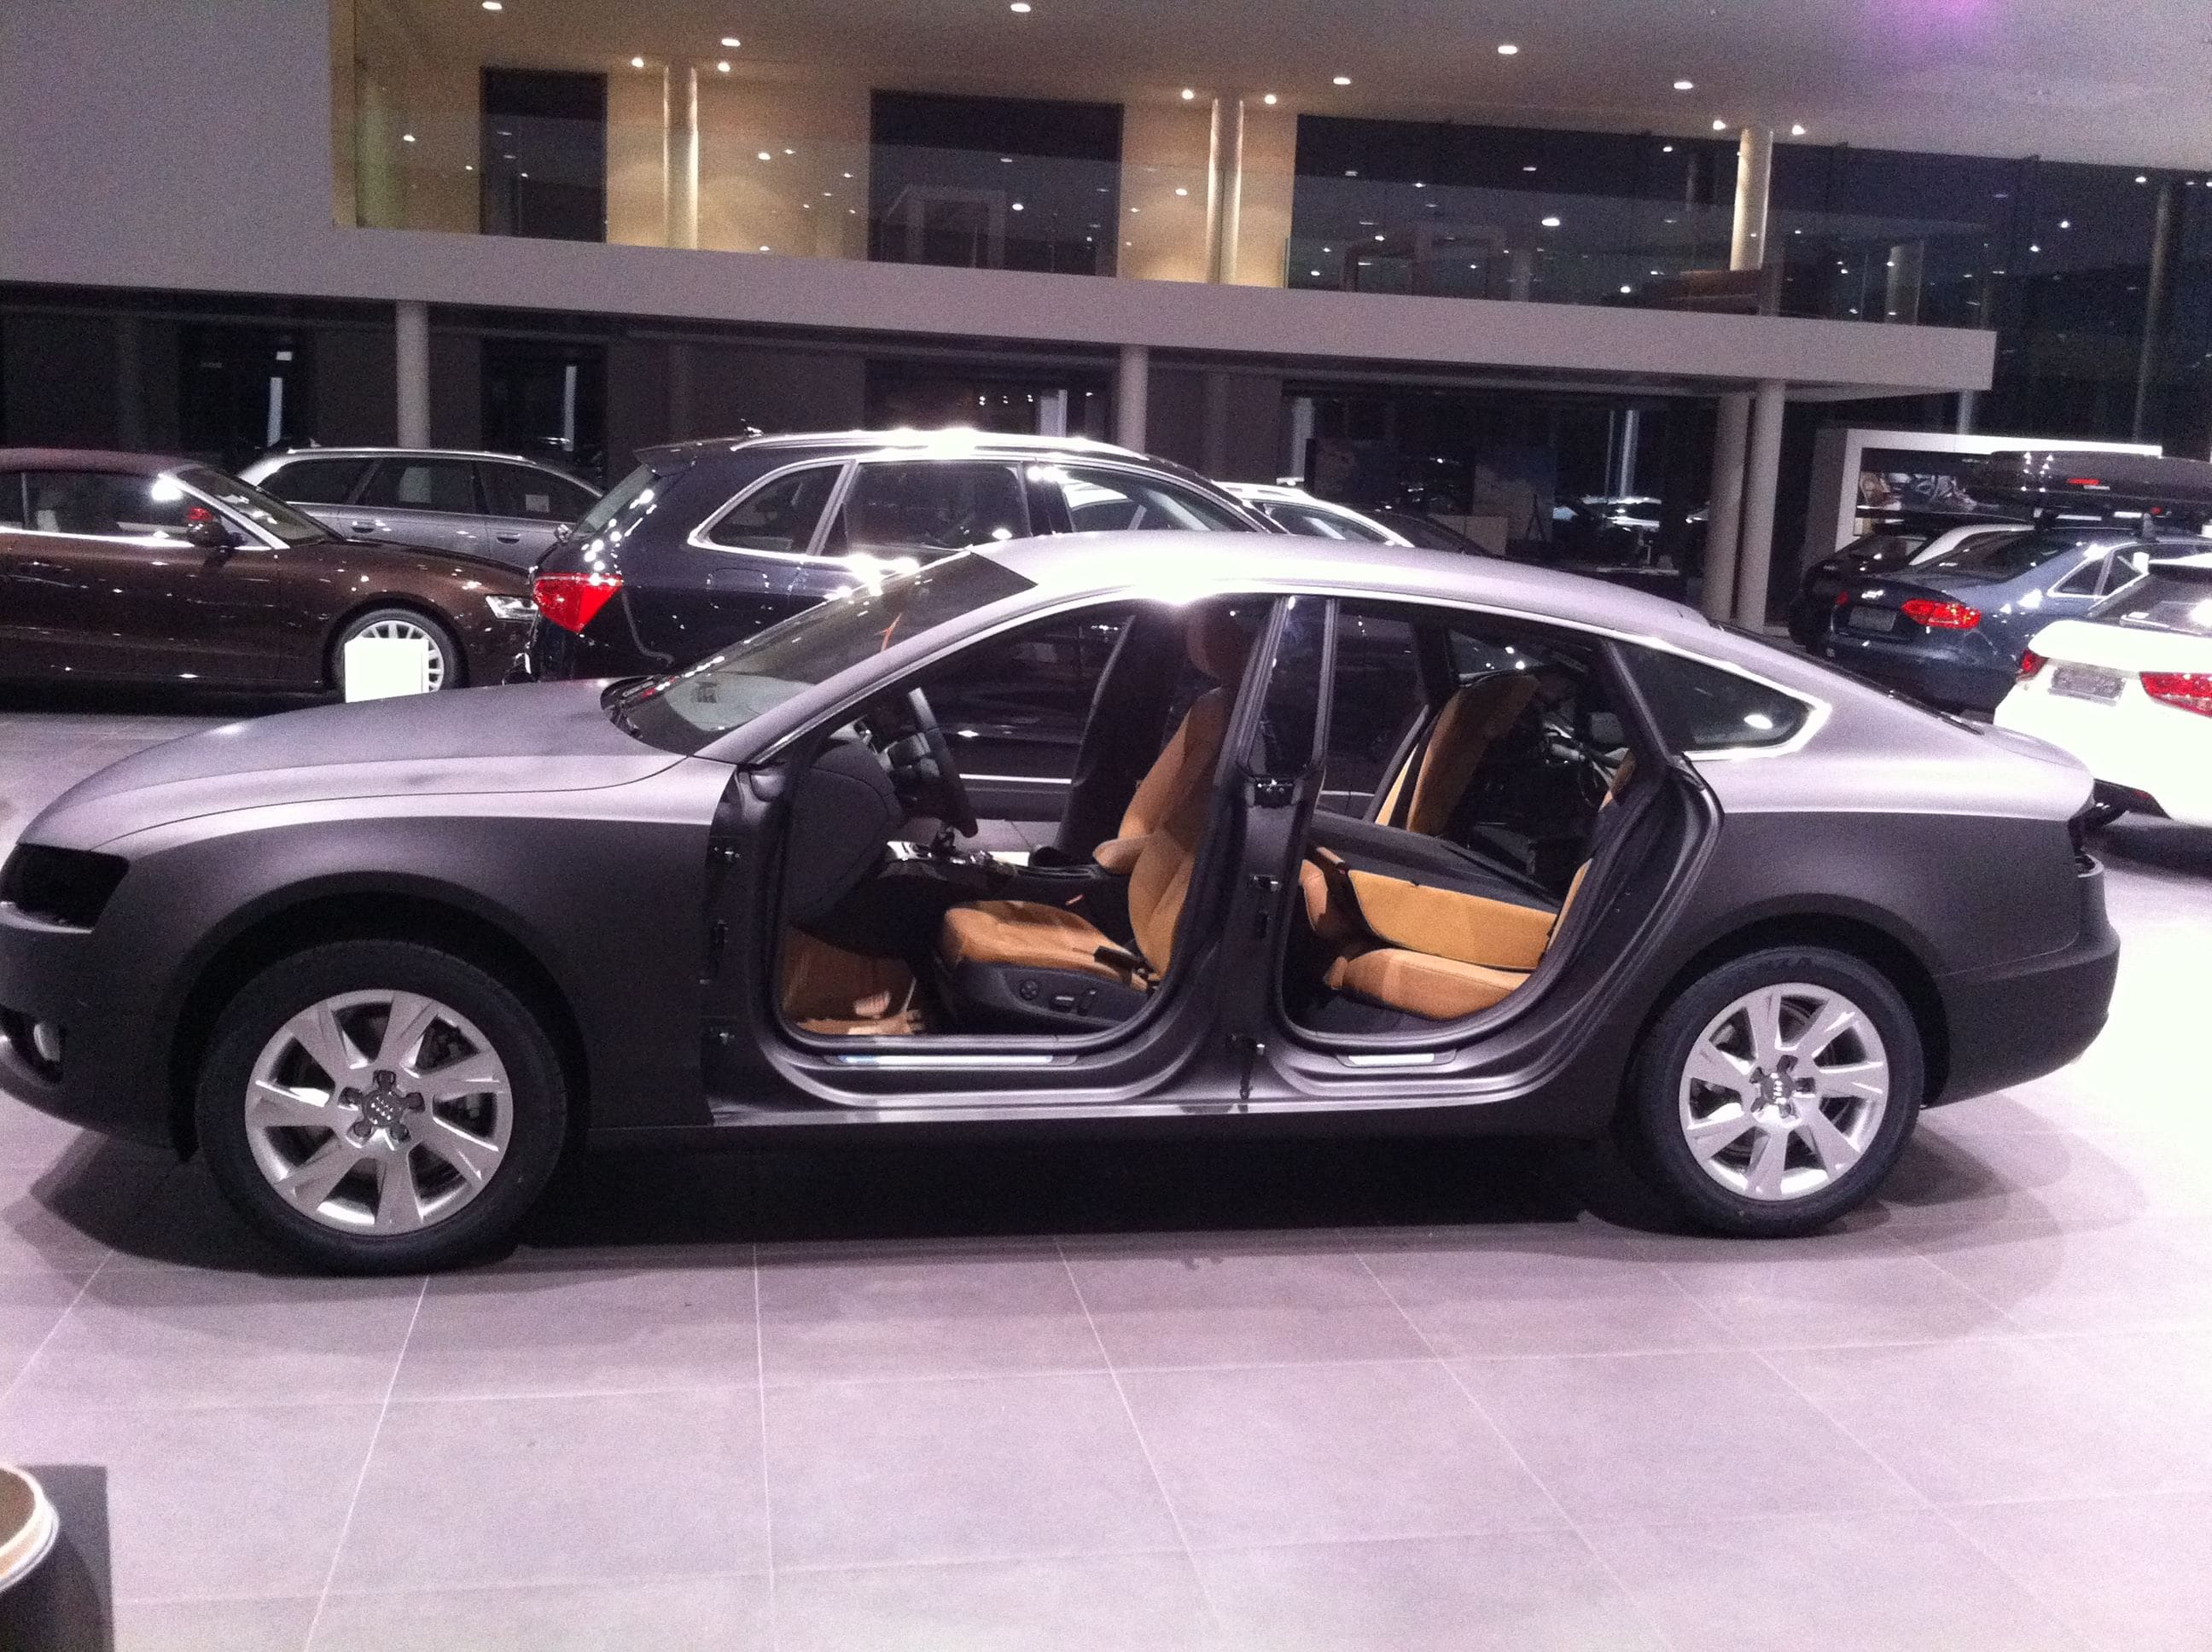 Audi A5 Sportback met Mat Grijze Wrap, Carwrapping door Wrapmyride.nu Foto-nr:4800, ©2021